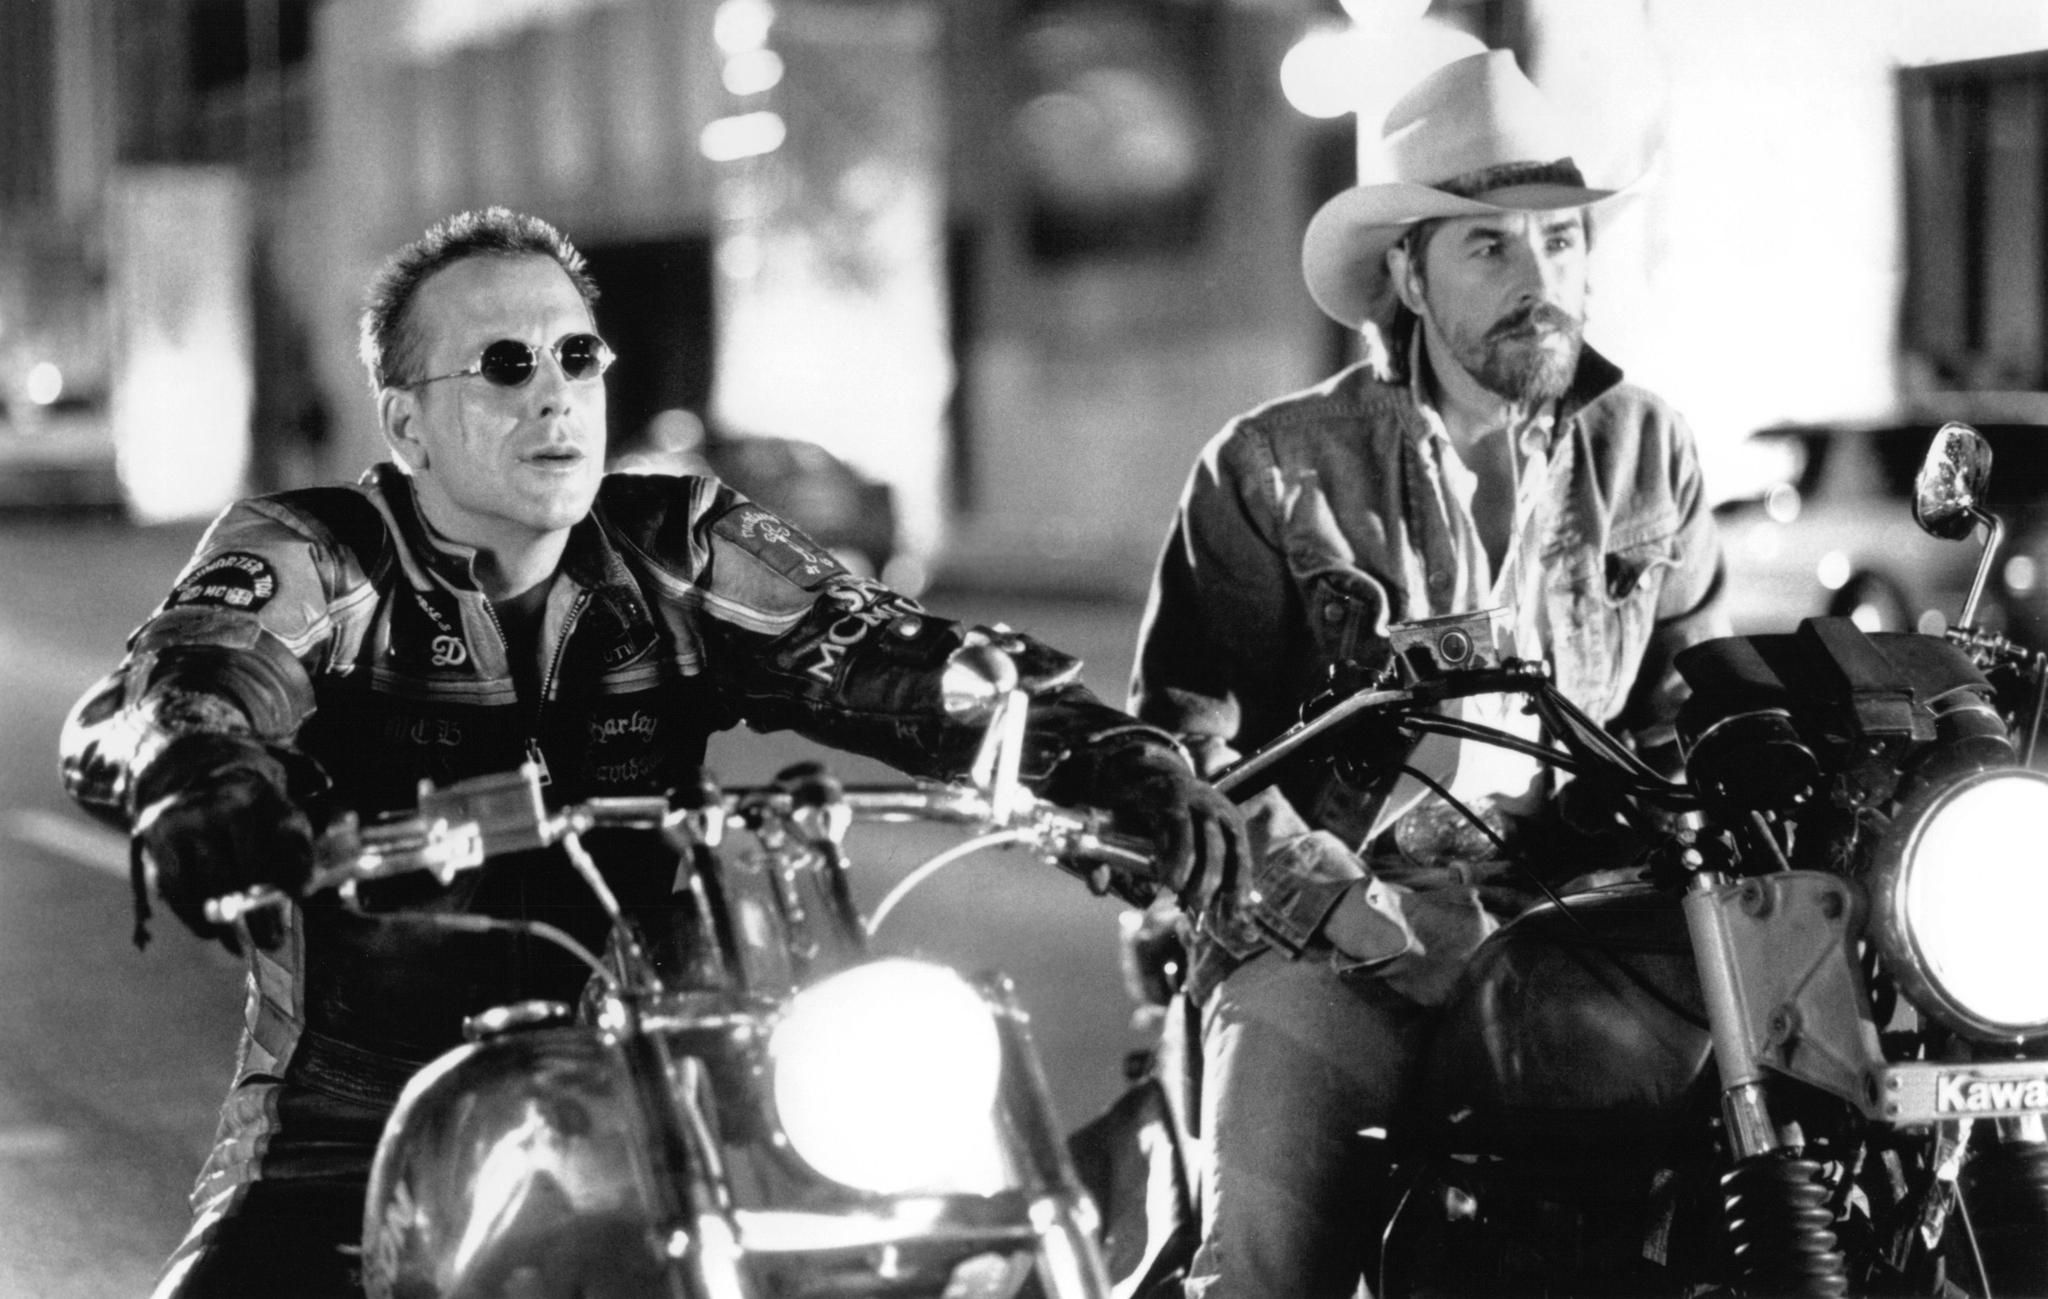 Harley Davidson Movie: And Mickey Rourke In Harley Davidson And The Marlboro Man